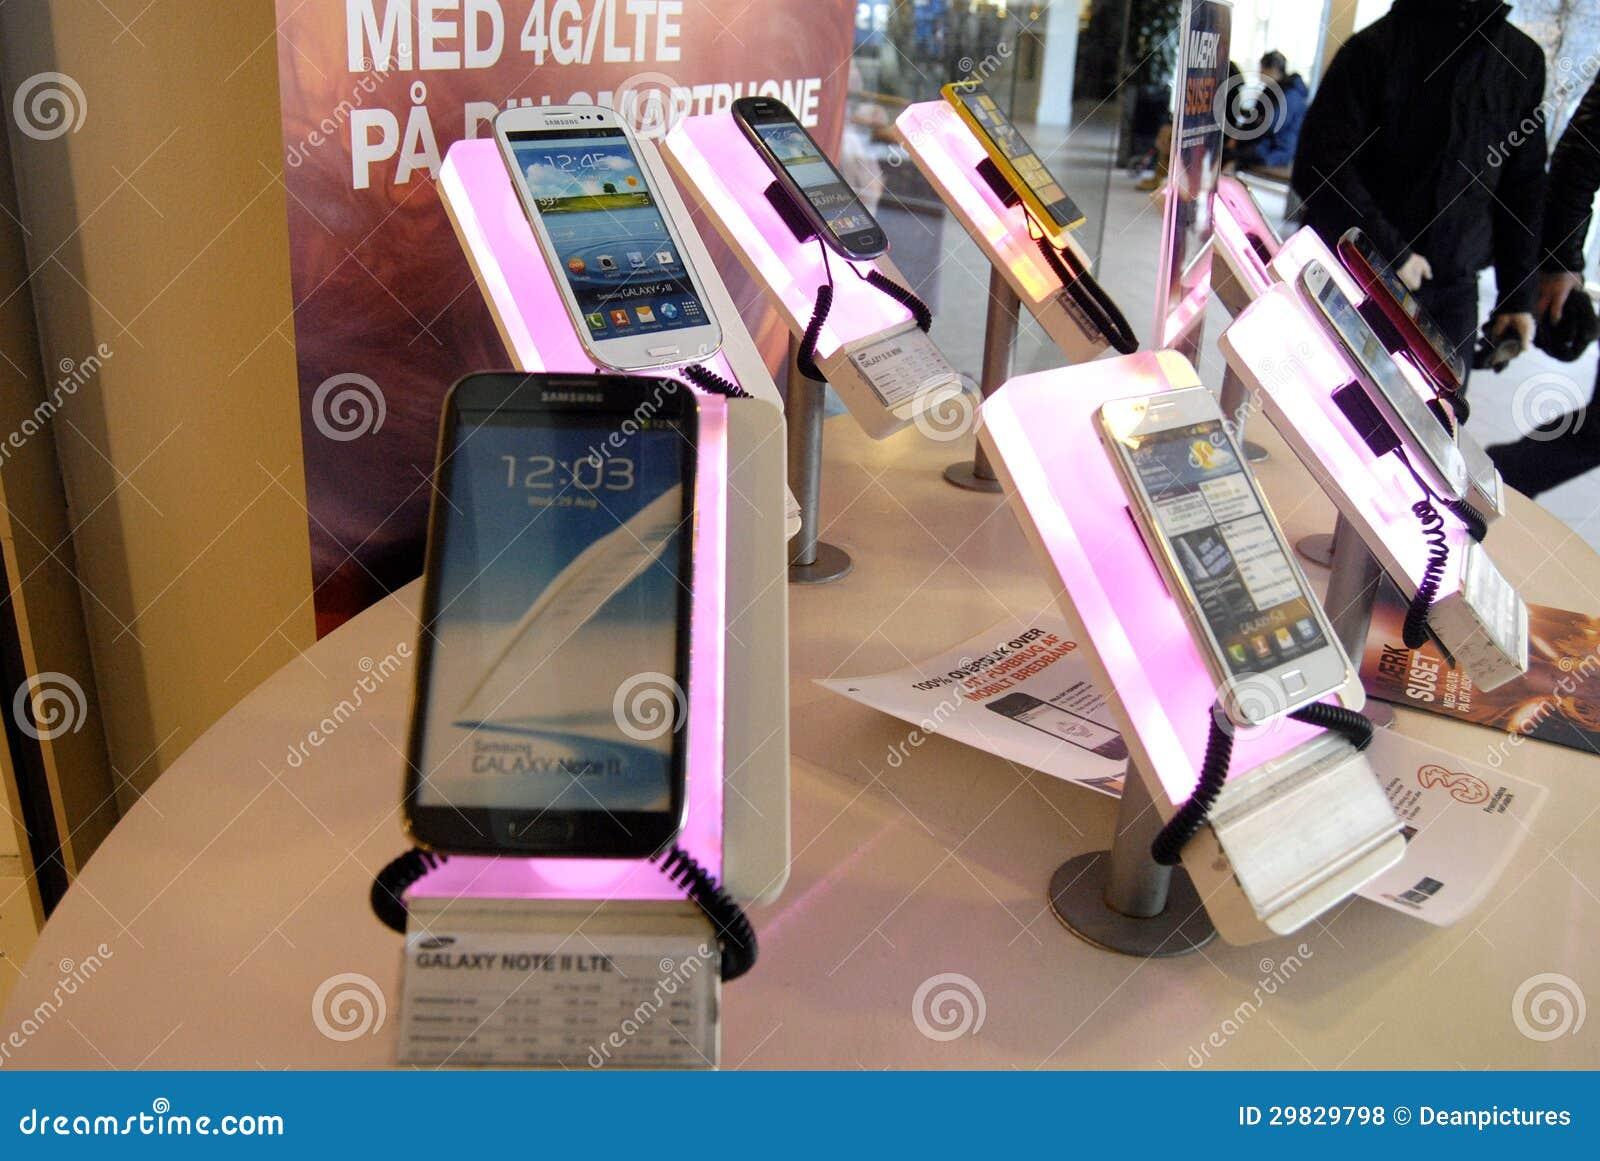 Samsung smartpones